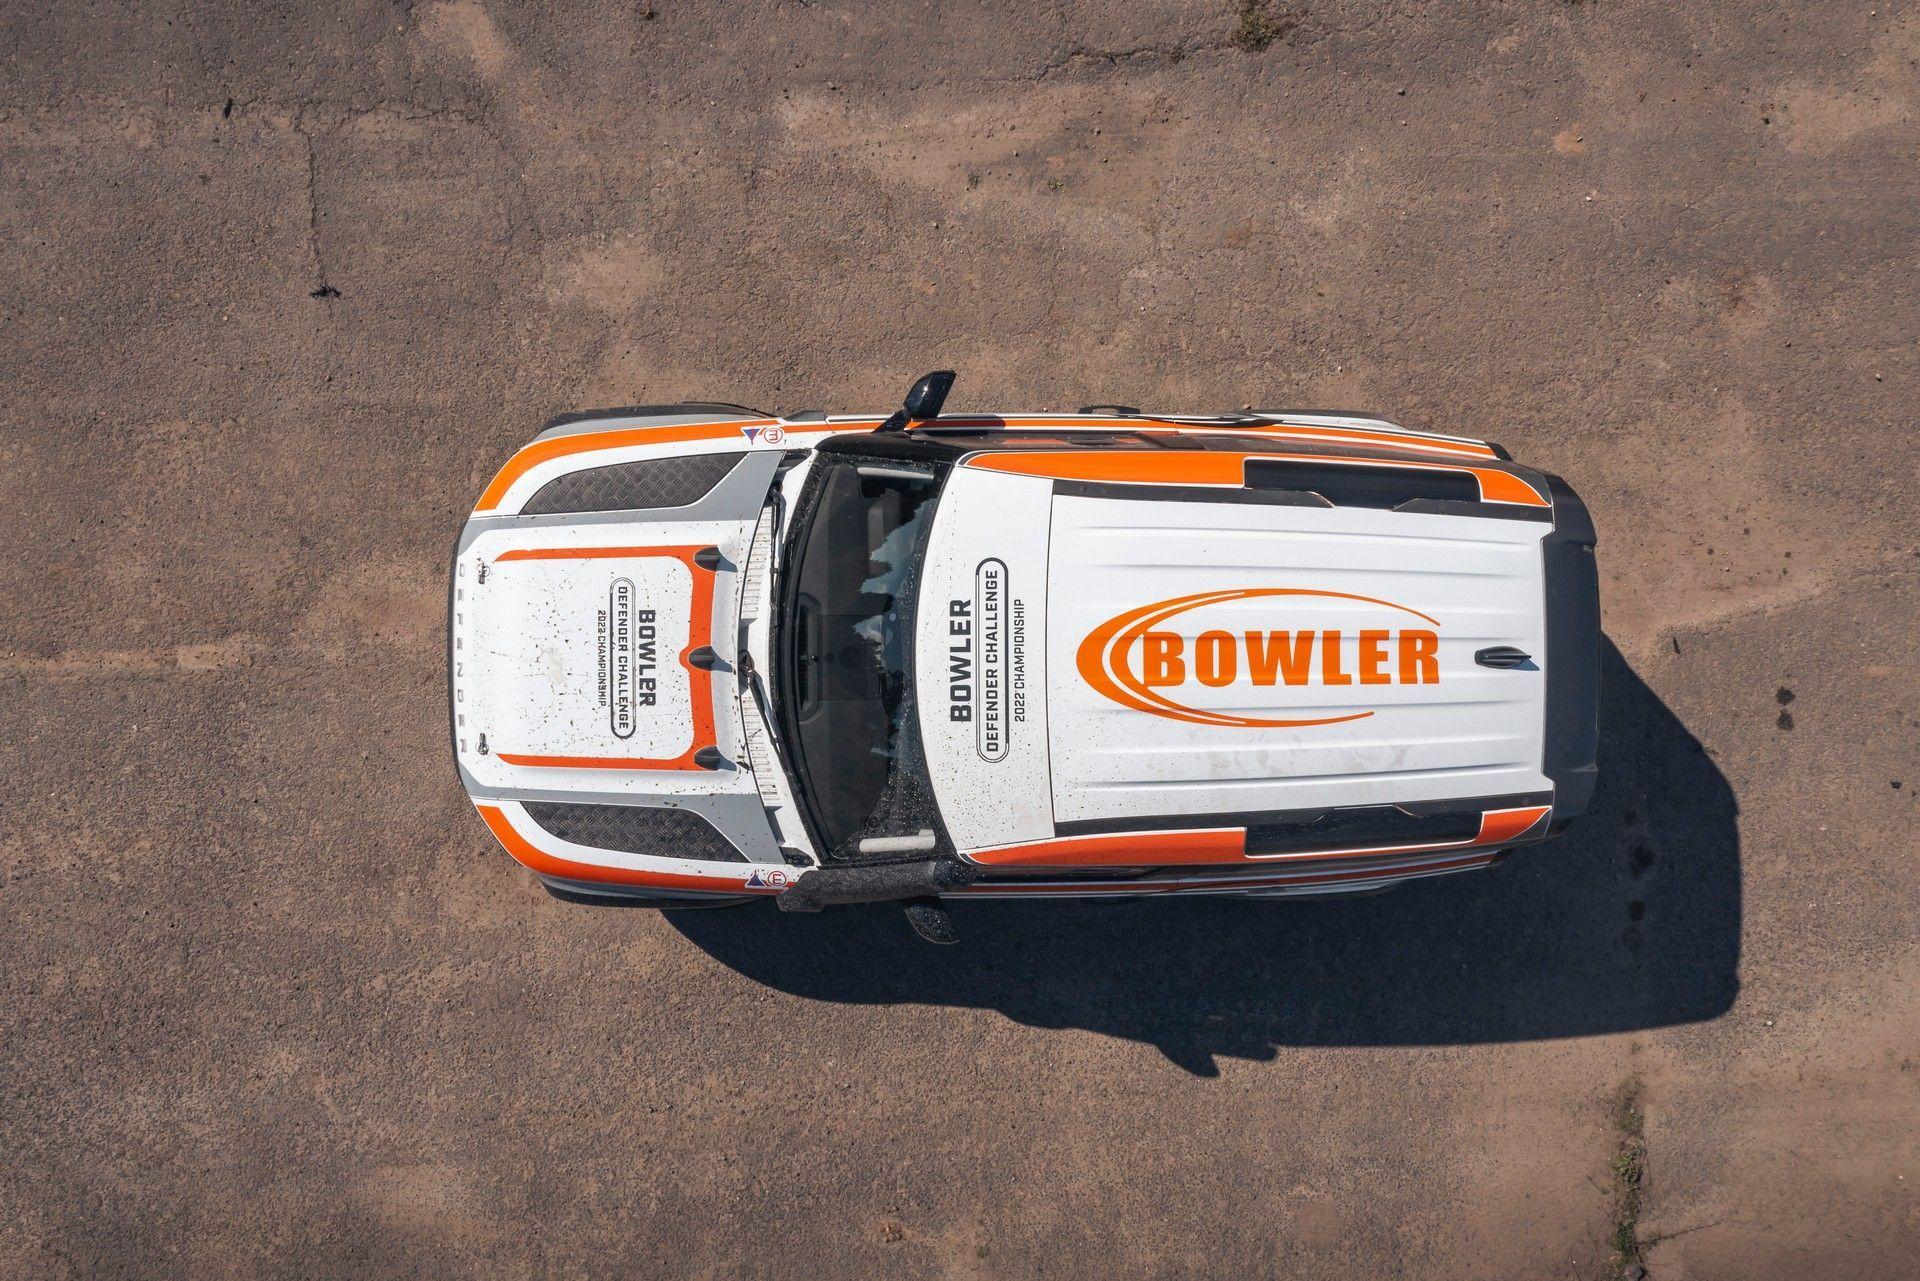 Bowler-Land-Rover-Defender-Challenge-Rally-Car-5